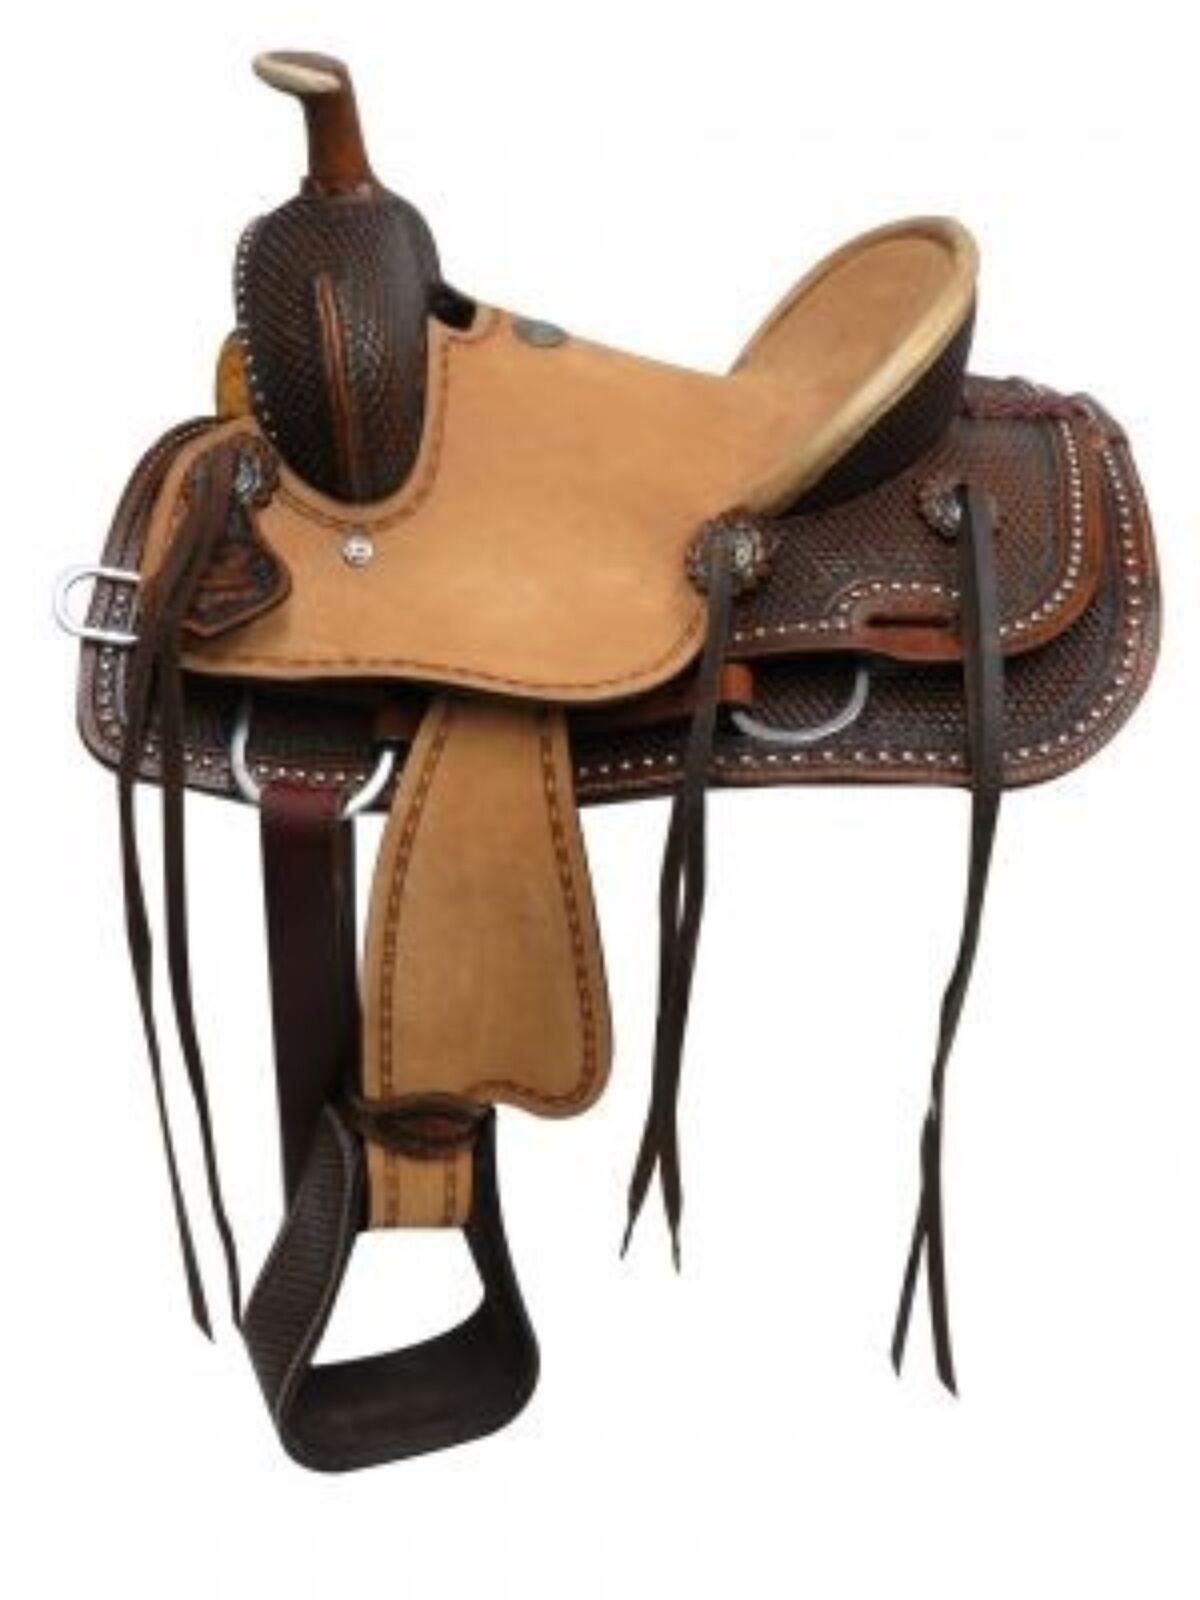 12  Double T Youth Hard Seat Roper Style Saddle With Basket Tooled Leather